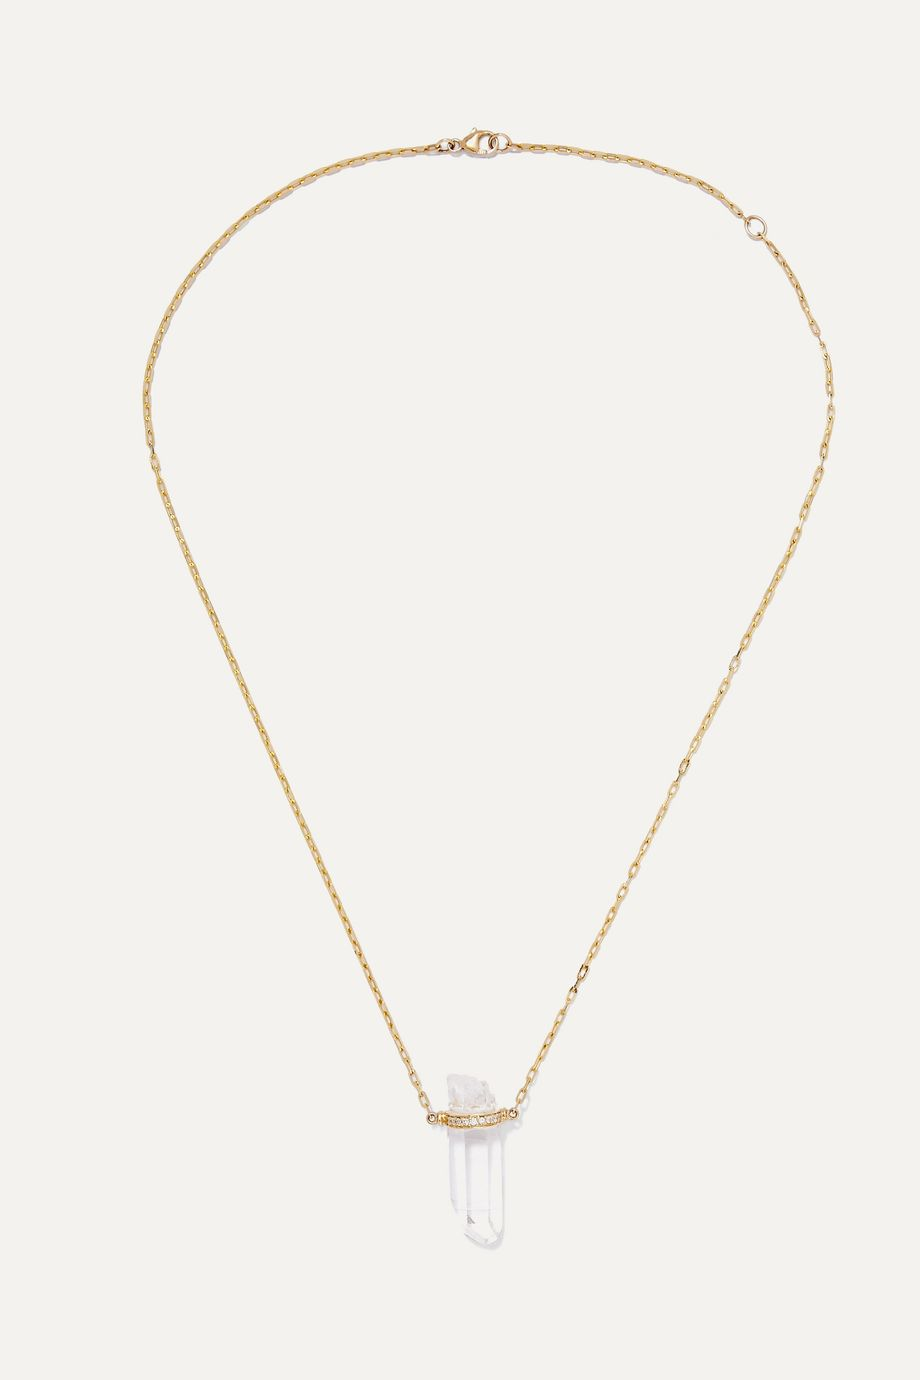 Harris Zhu 14-karat gold, crystal quartz and diamond necklace